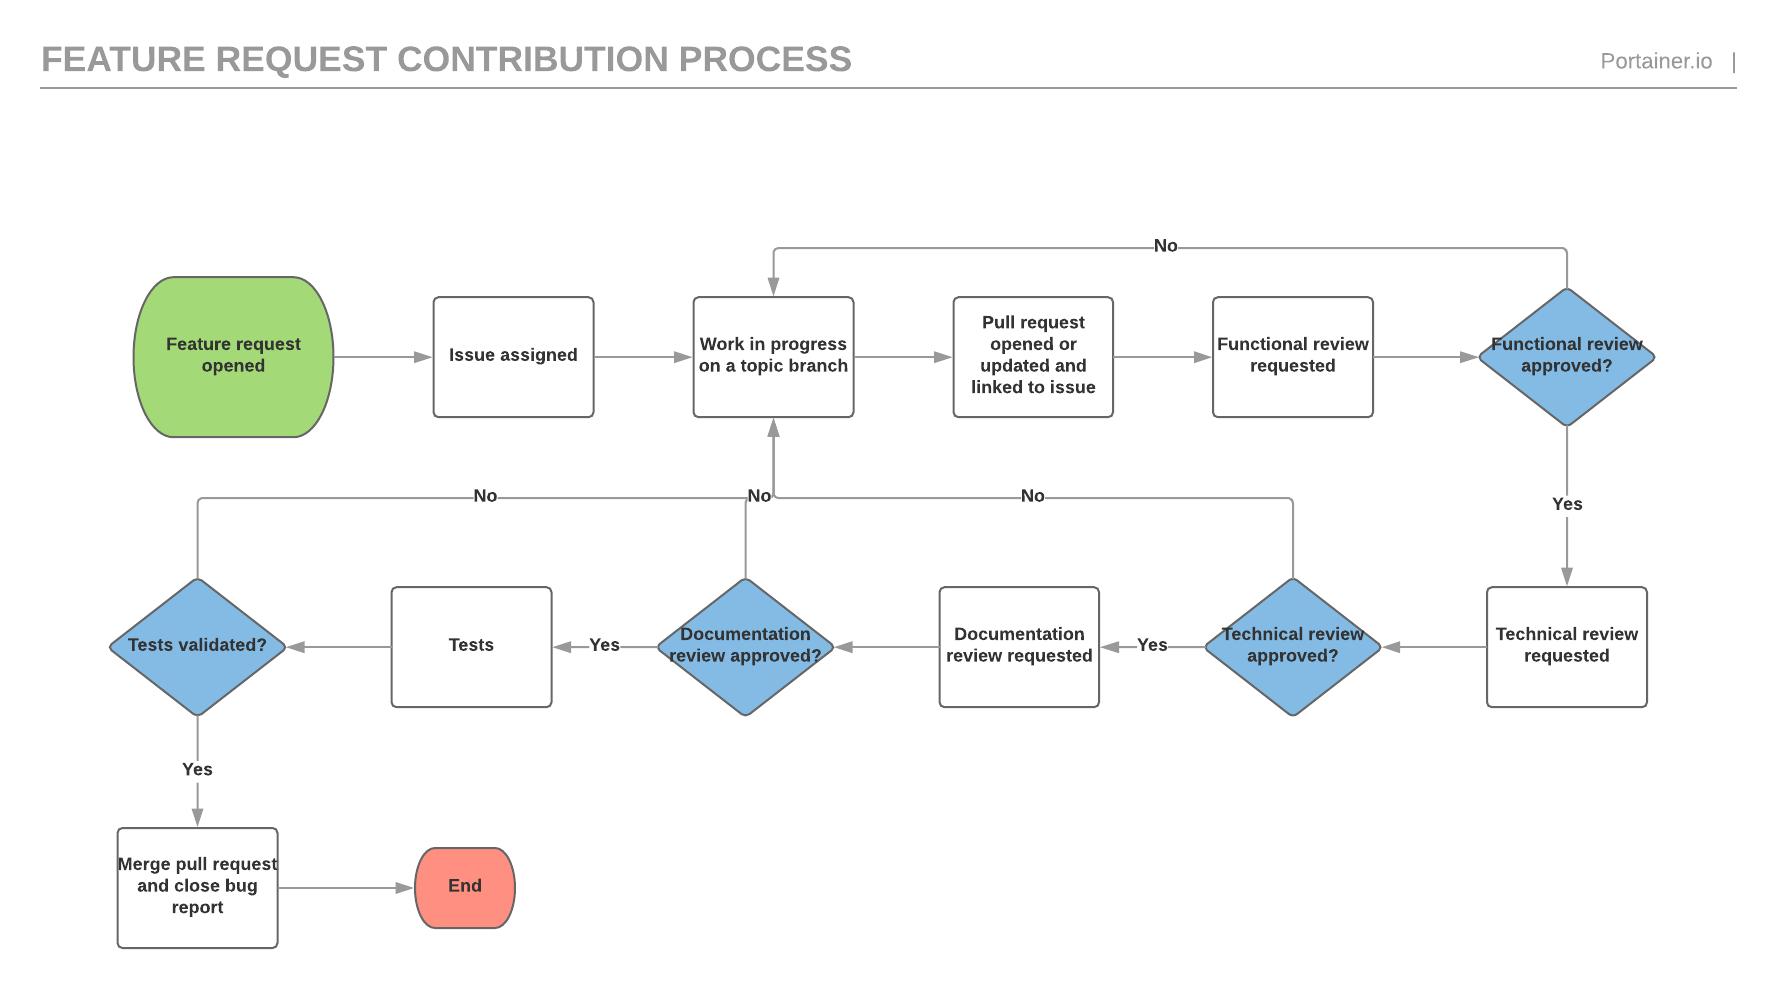 portainer_featurerequest_workflow